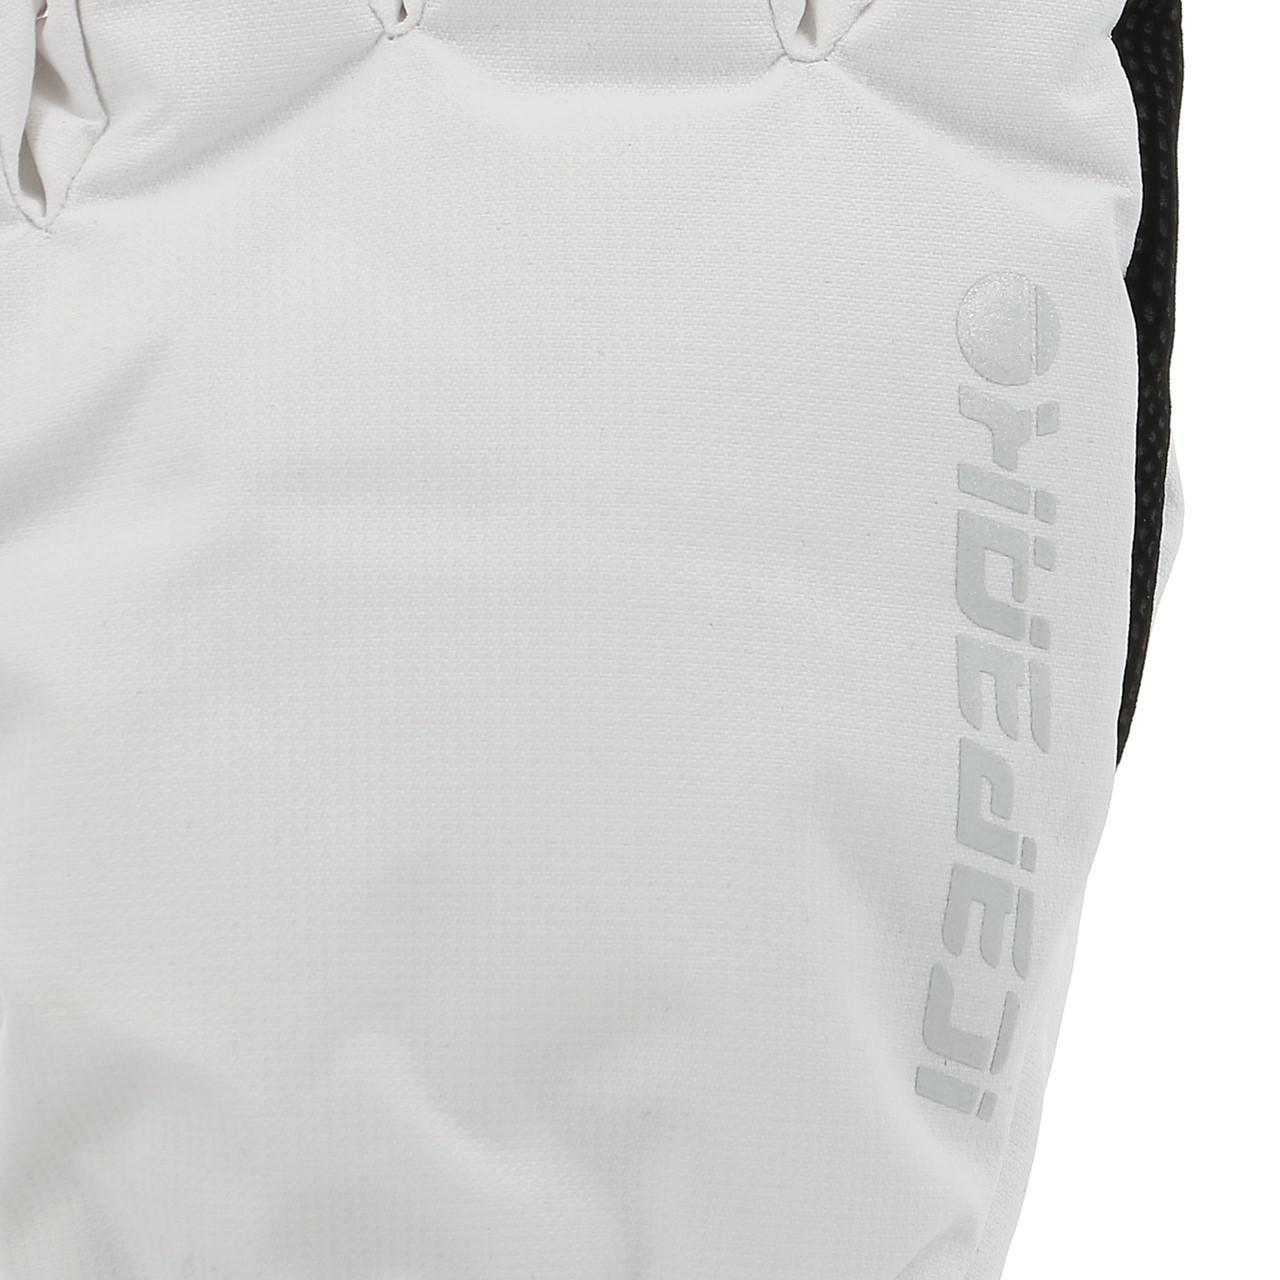 Gants-de-ski-Icepeak-Diisa-blanc-gants-ski-l-Blanc-14370-Neuf miniature 4